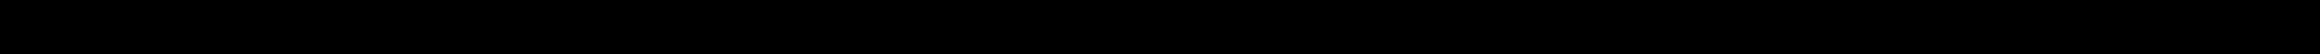 PHILIPS 12-97700611, D45081300, 069-037-0707, 1089.0576.01, 165 945 097 Lemputė, indikatorius